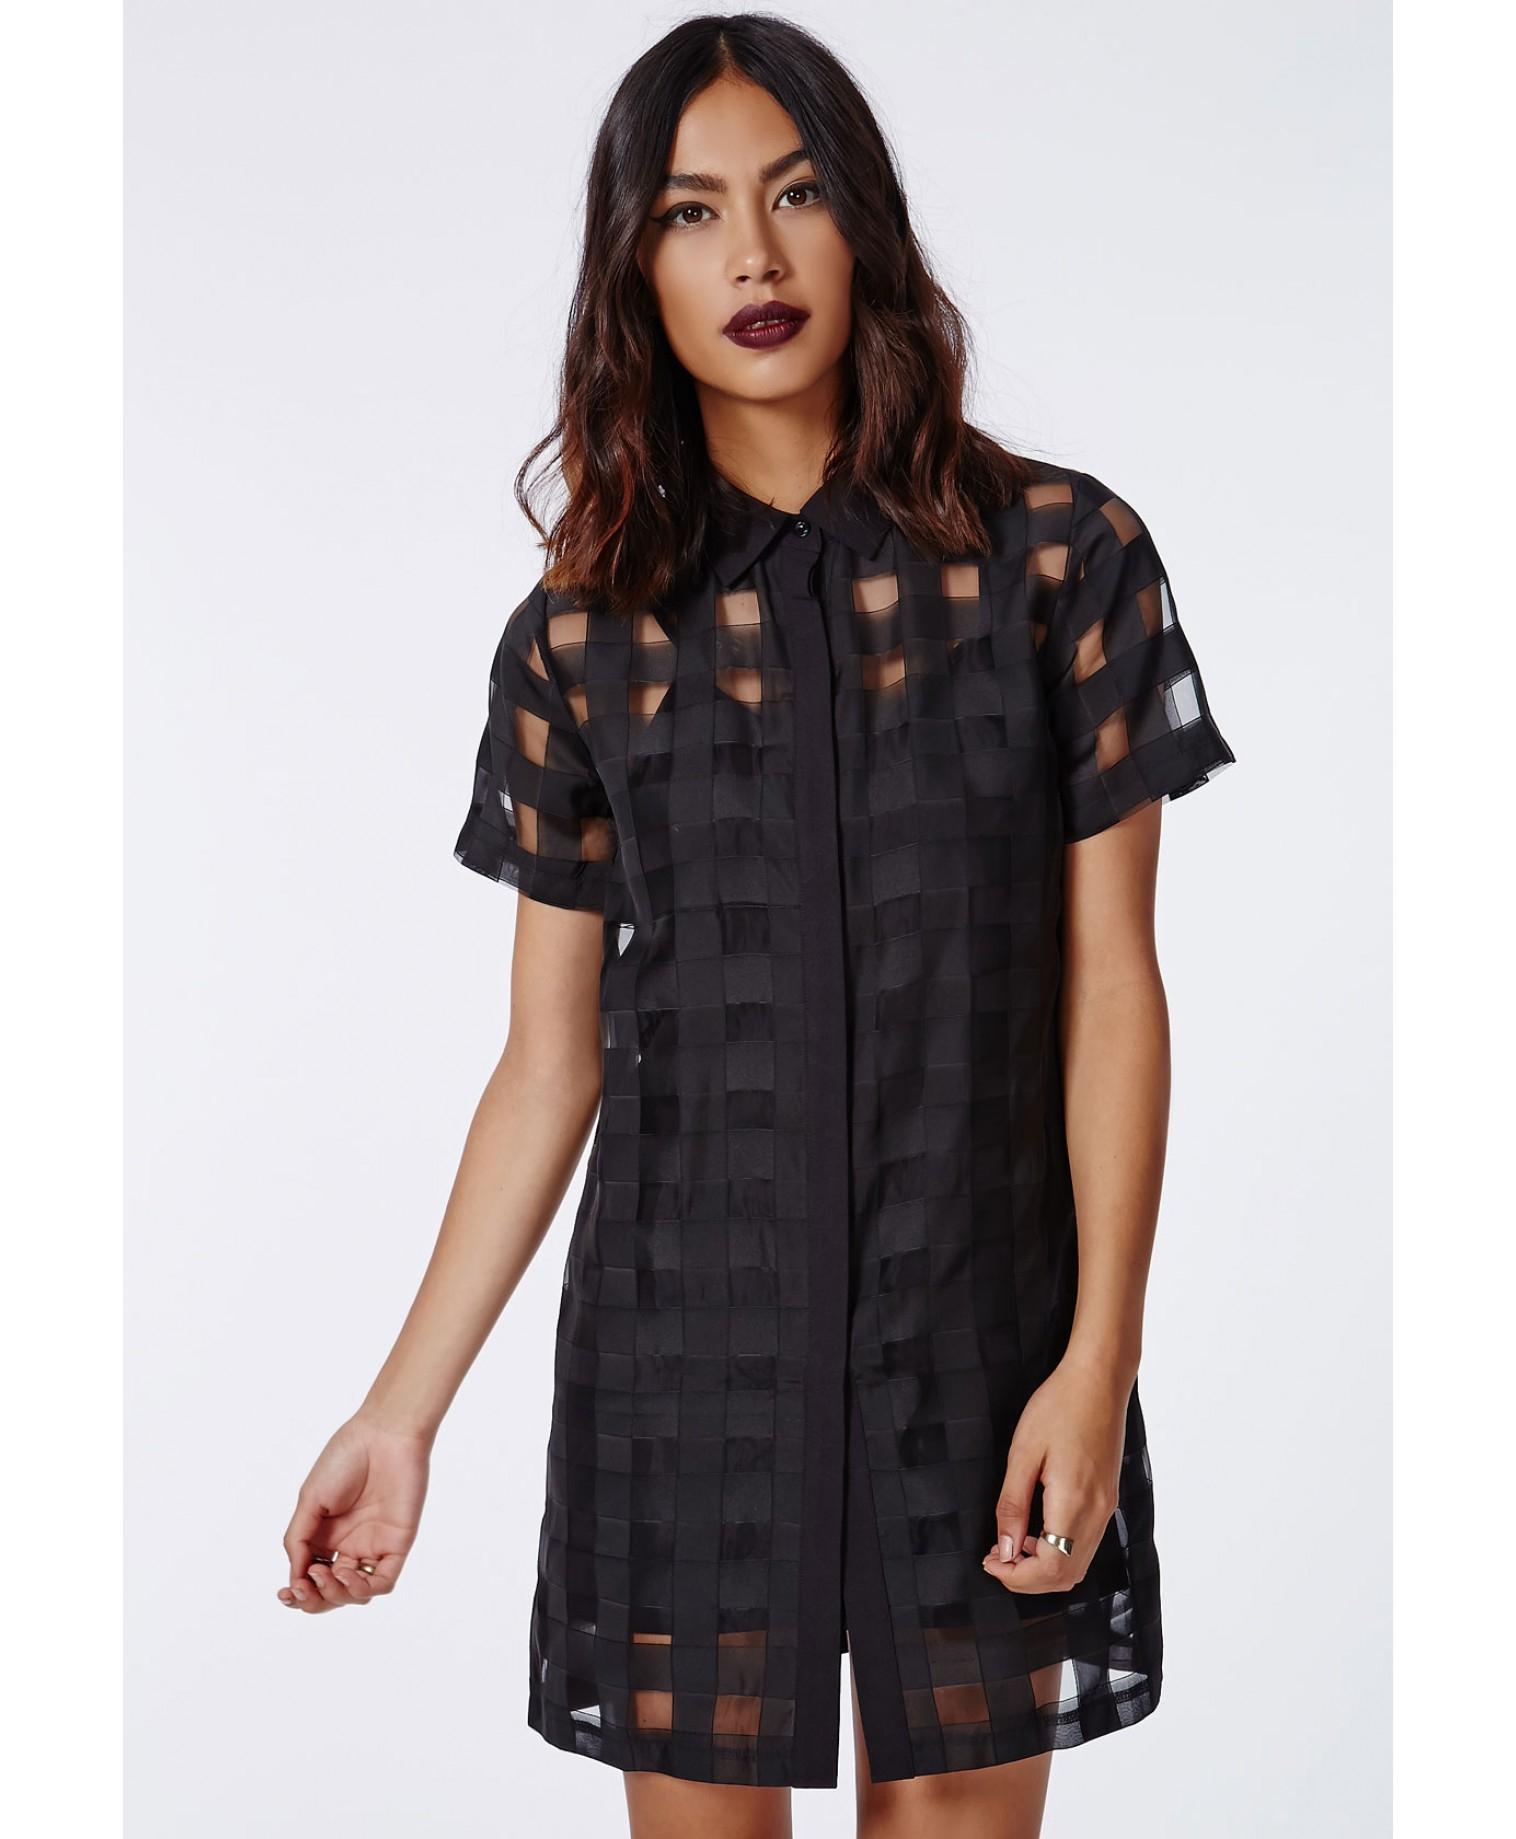 Missguided Jenifry Semi-sheer Check Shirt Dress Black in Black   Lyst